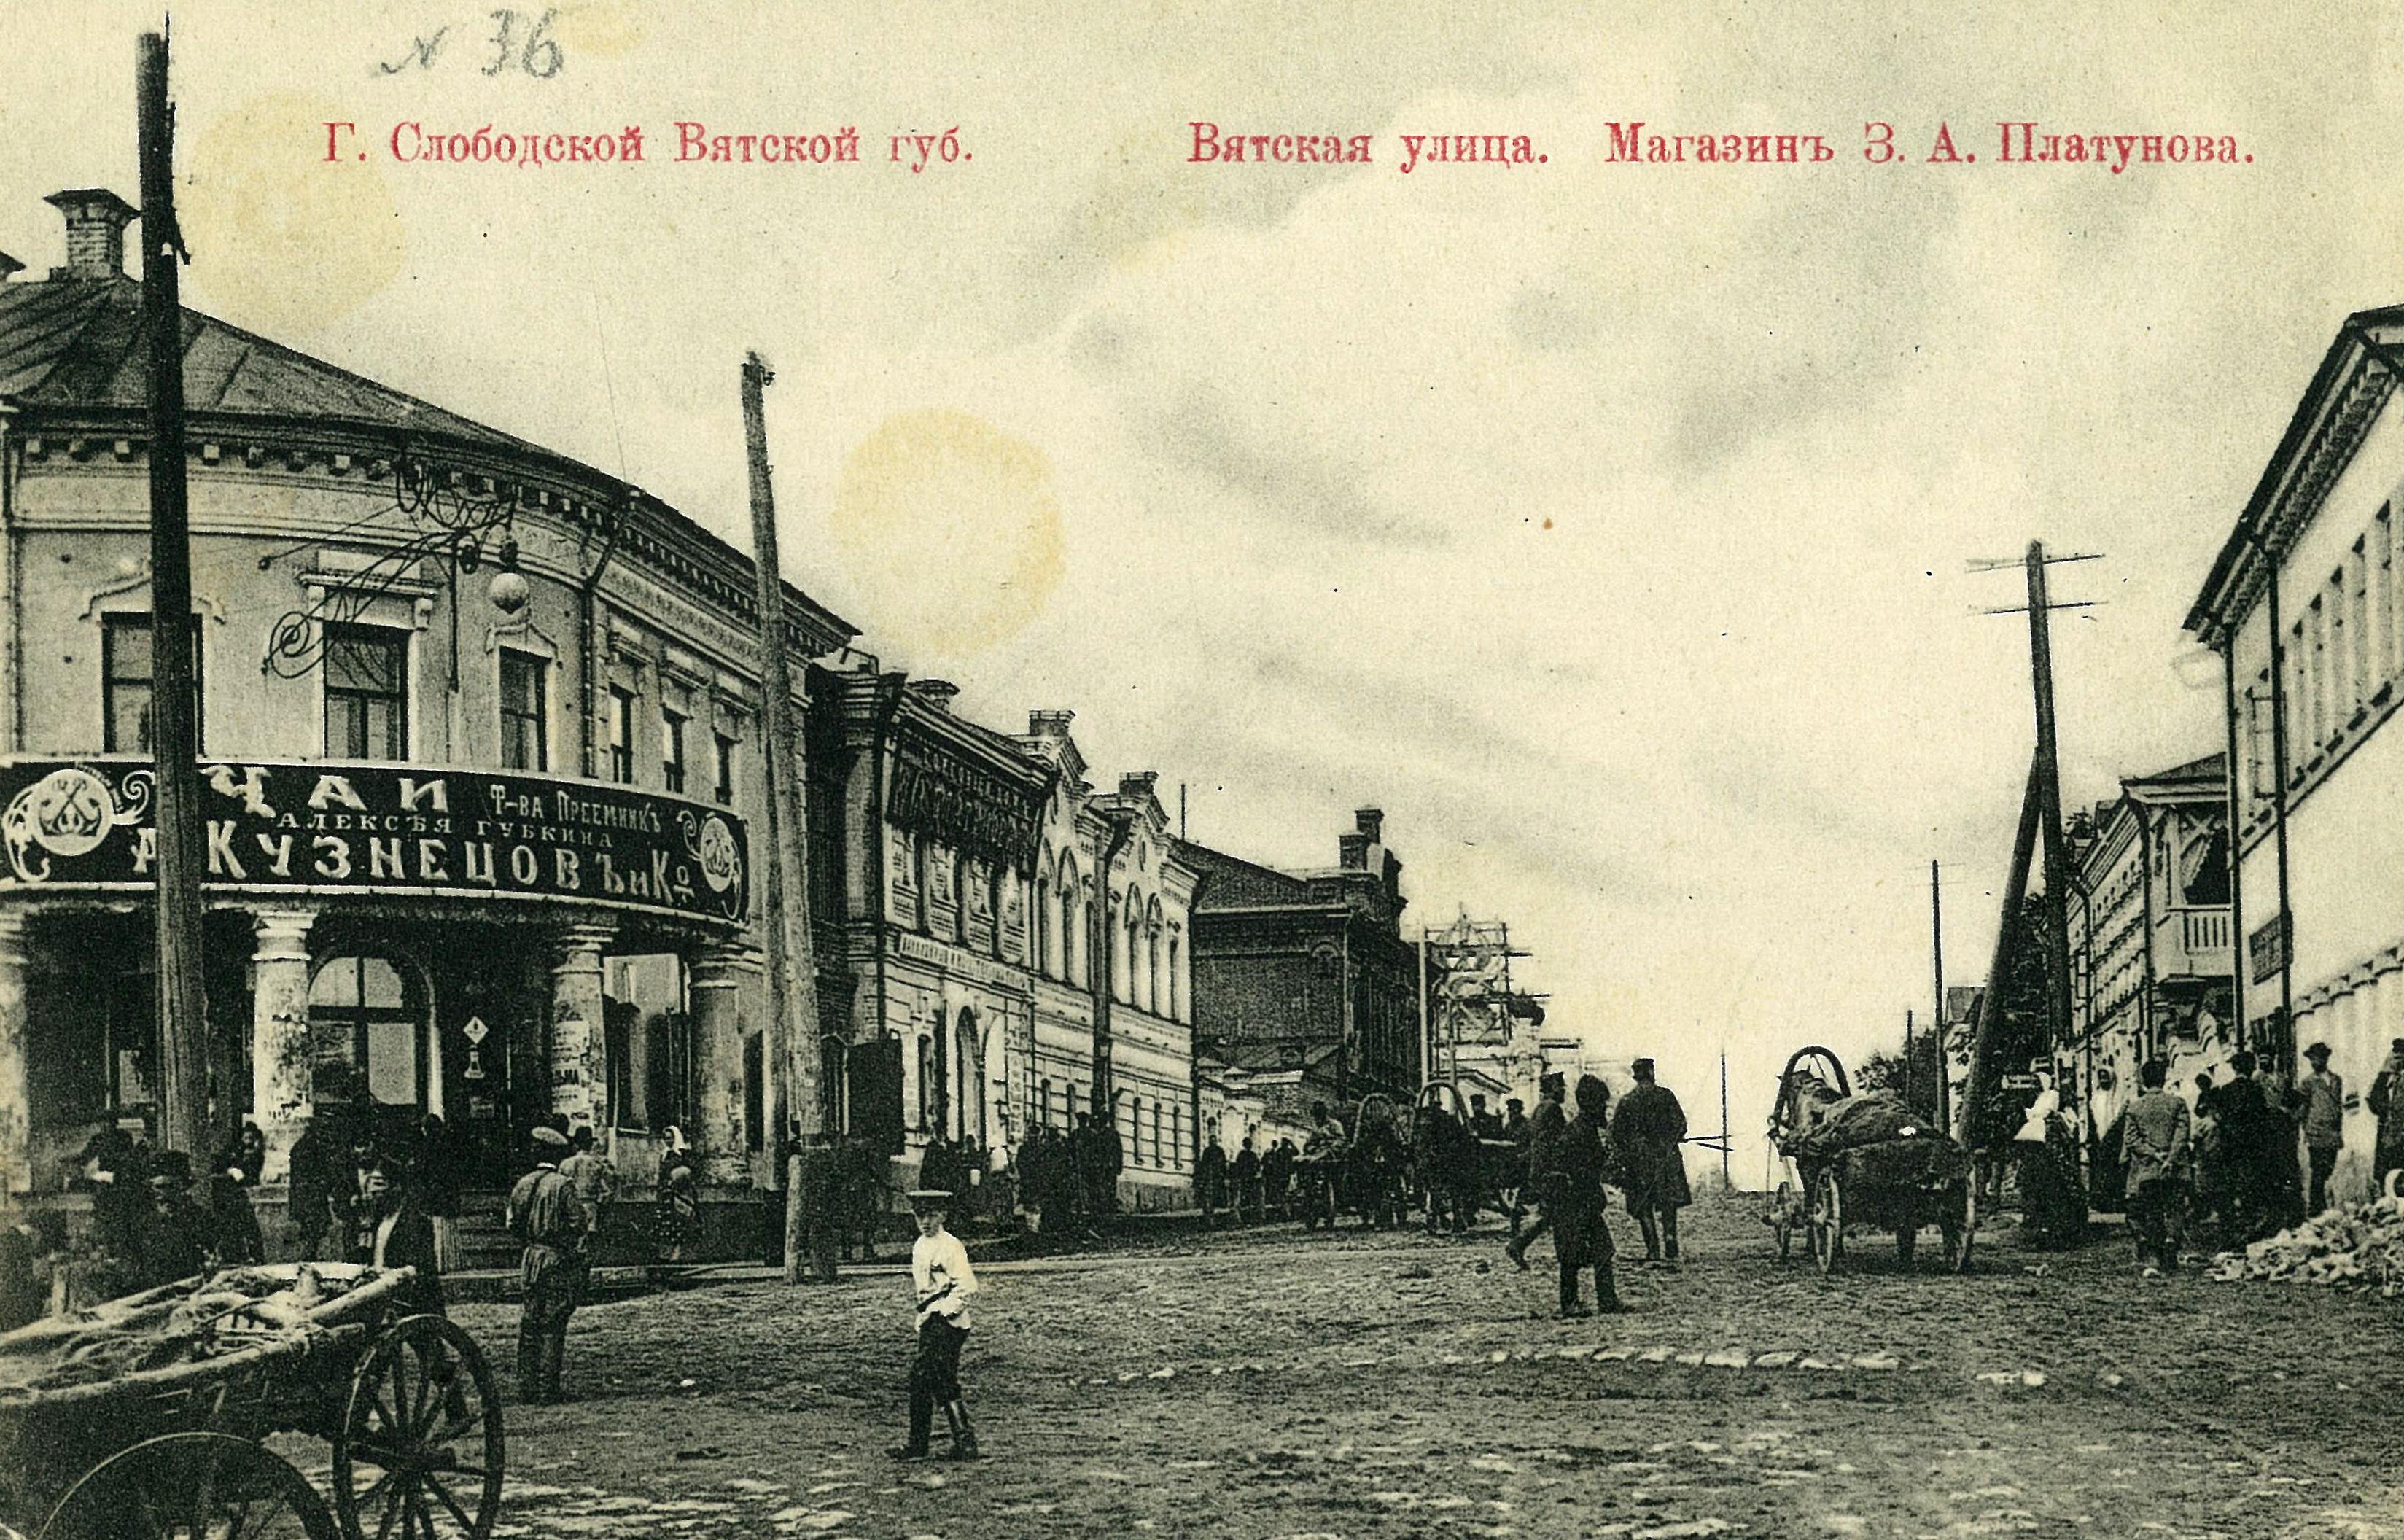 Вятская улица. Магазин З. А. Платунова